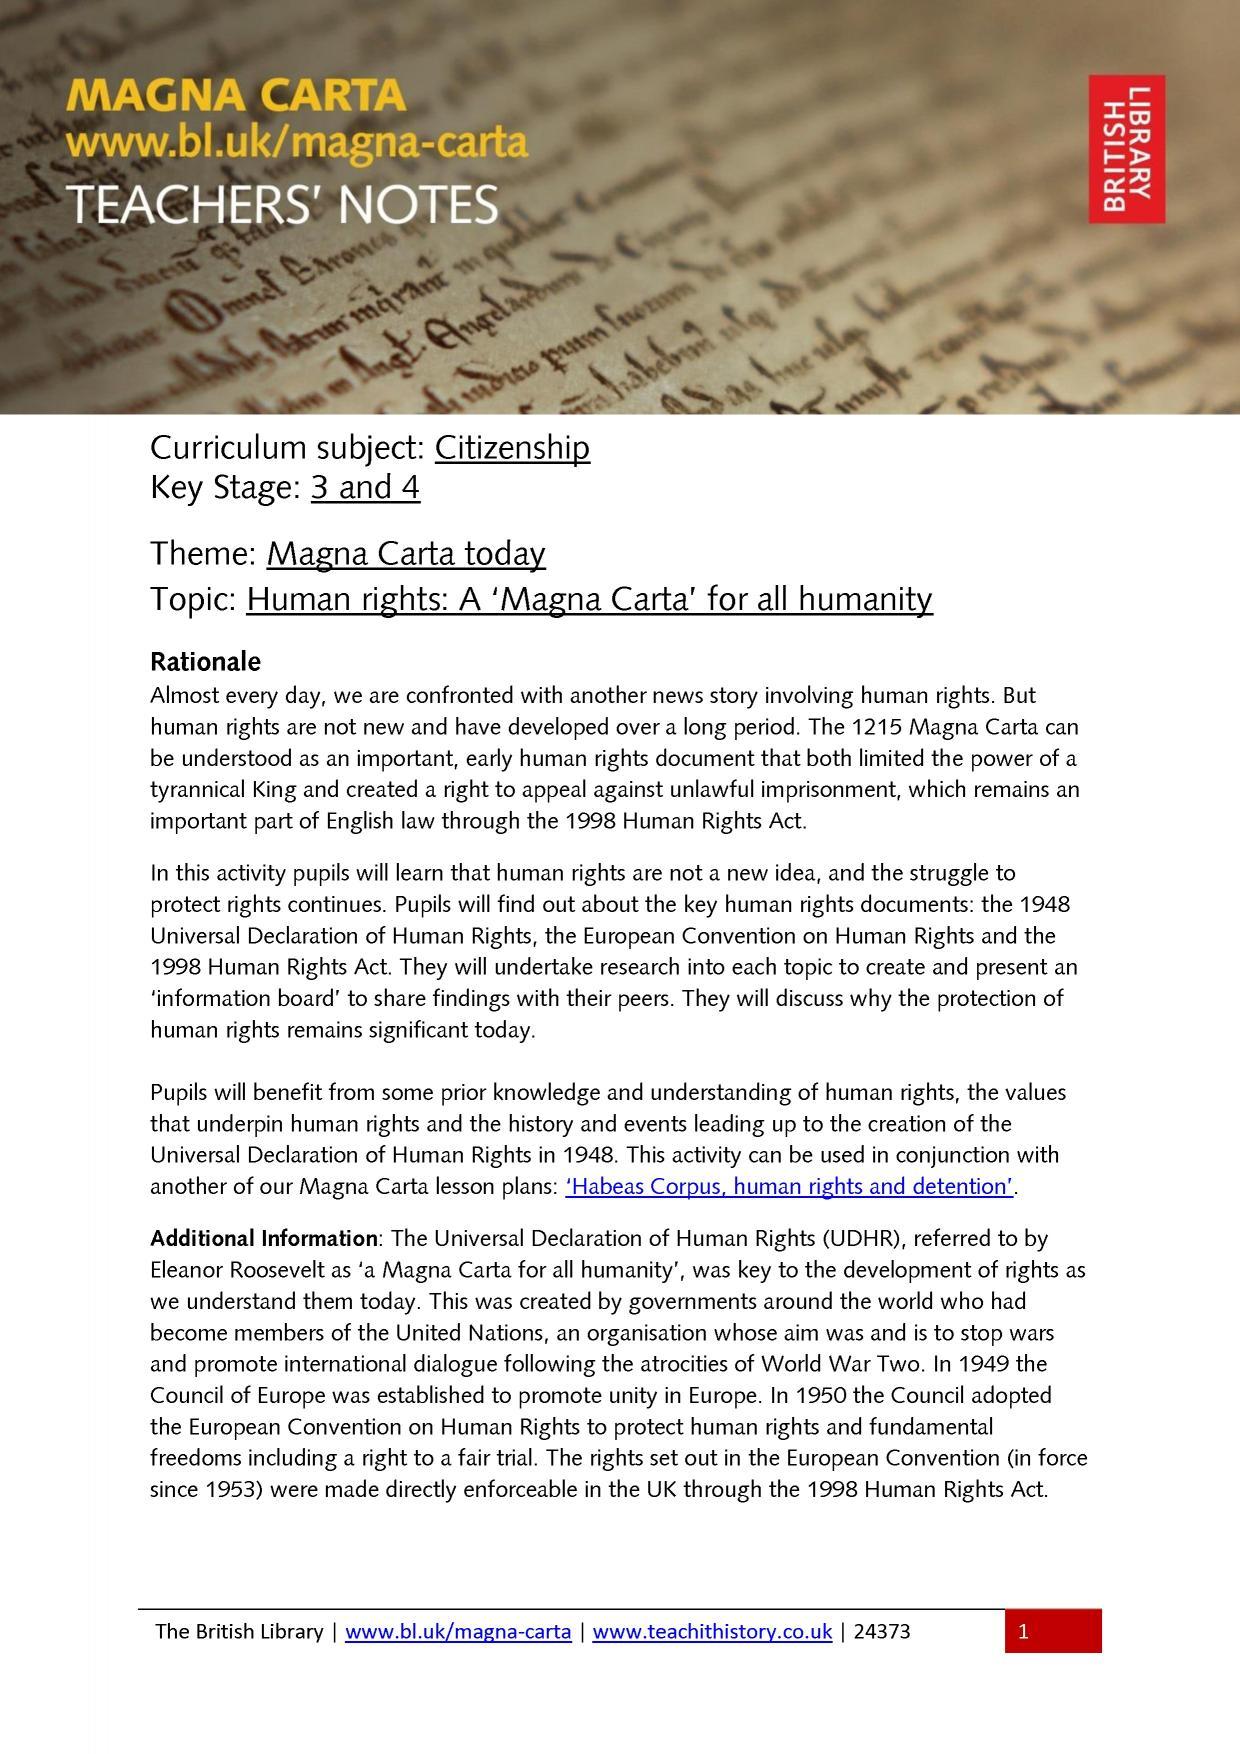 Worksheets Magna Carta Worksheet ks3 british library magna carta resources teachit history 0 preview